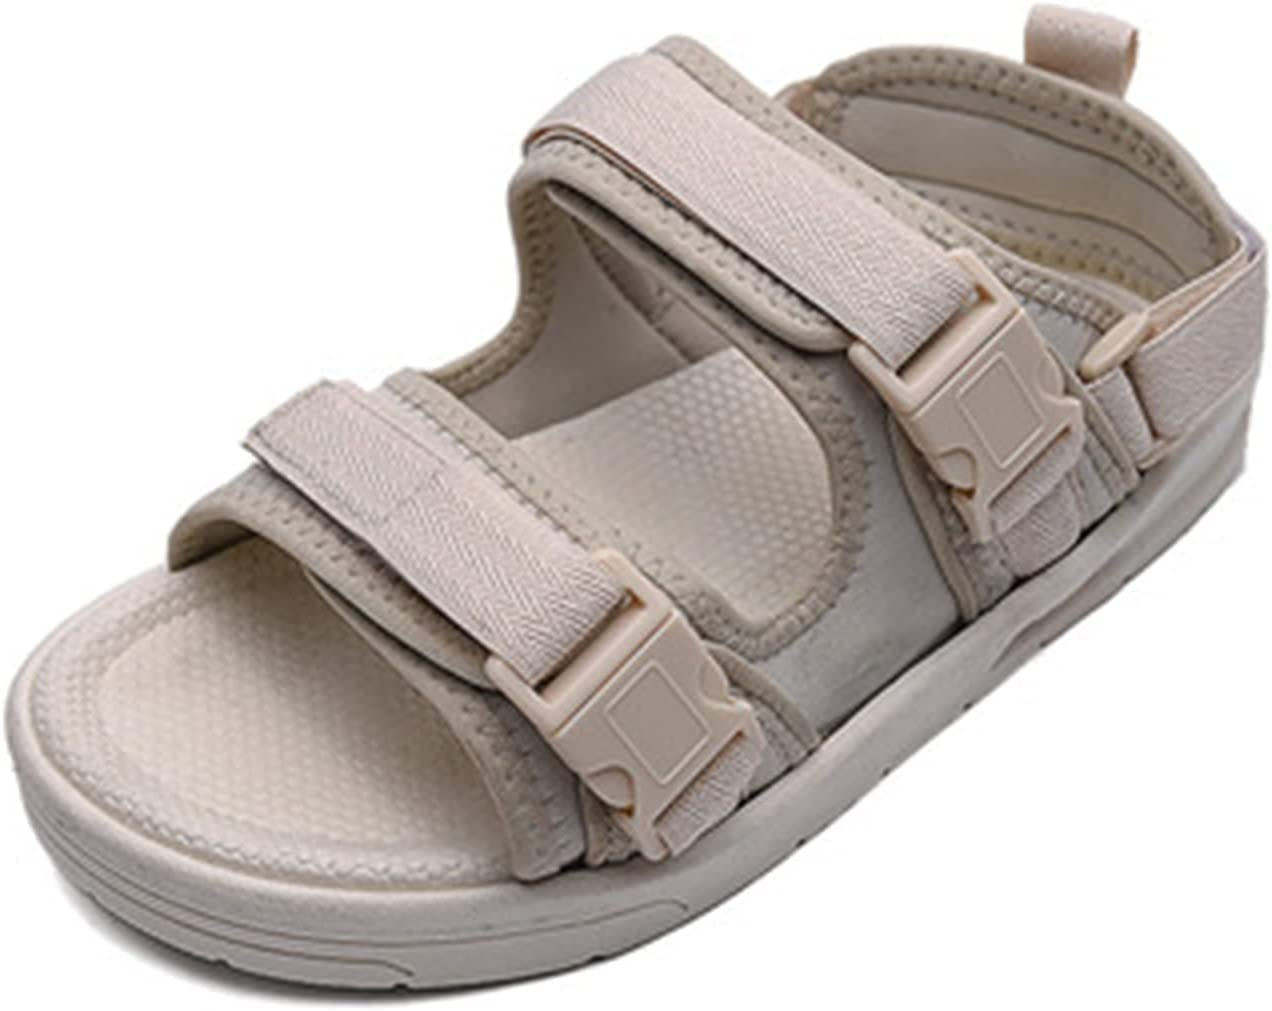 Men's Sandal Beach Shoes Women's Outdoor Hiking Walking Sandals Comfortable Athletic Sports Light Shoes Elegant Open Toe Thick Bottom Shoes (Color : Beige, Size : 44)